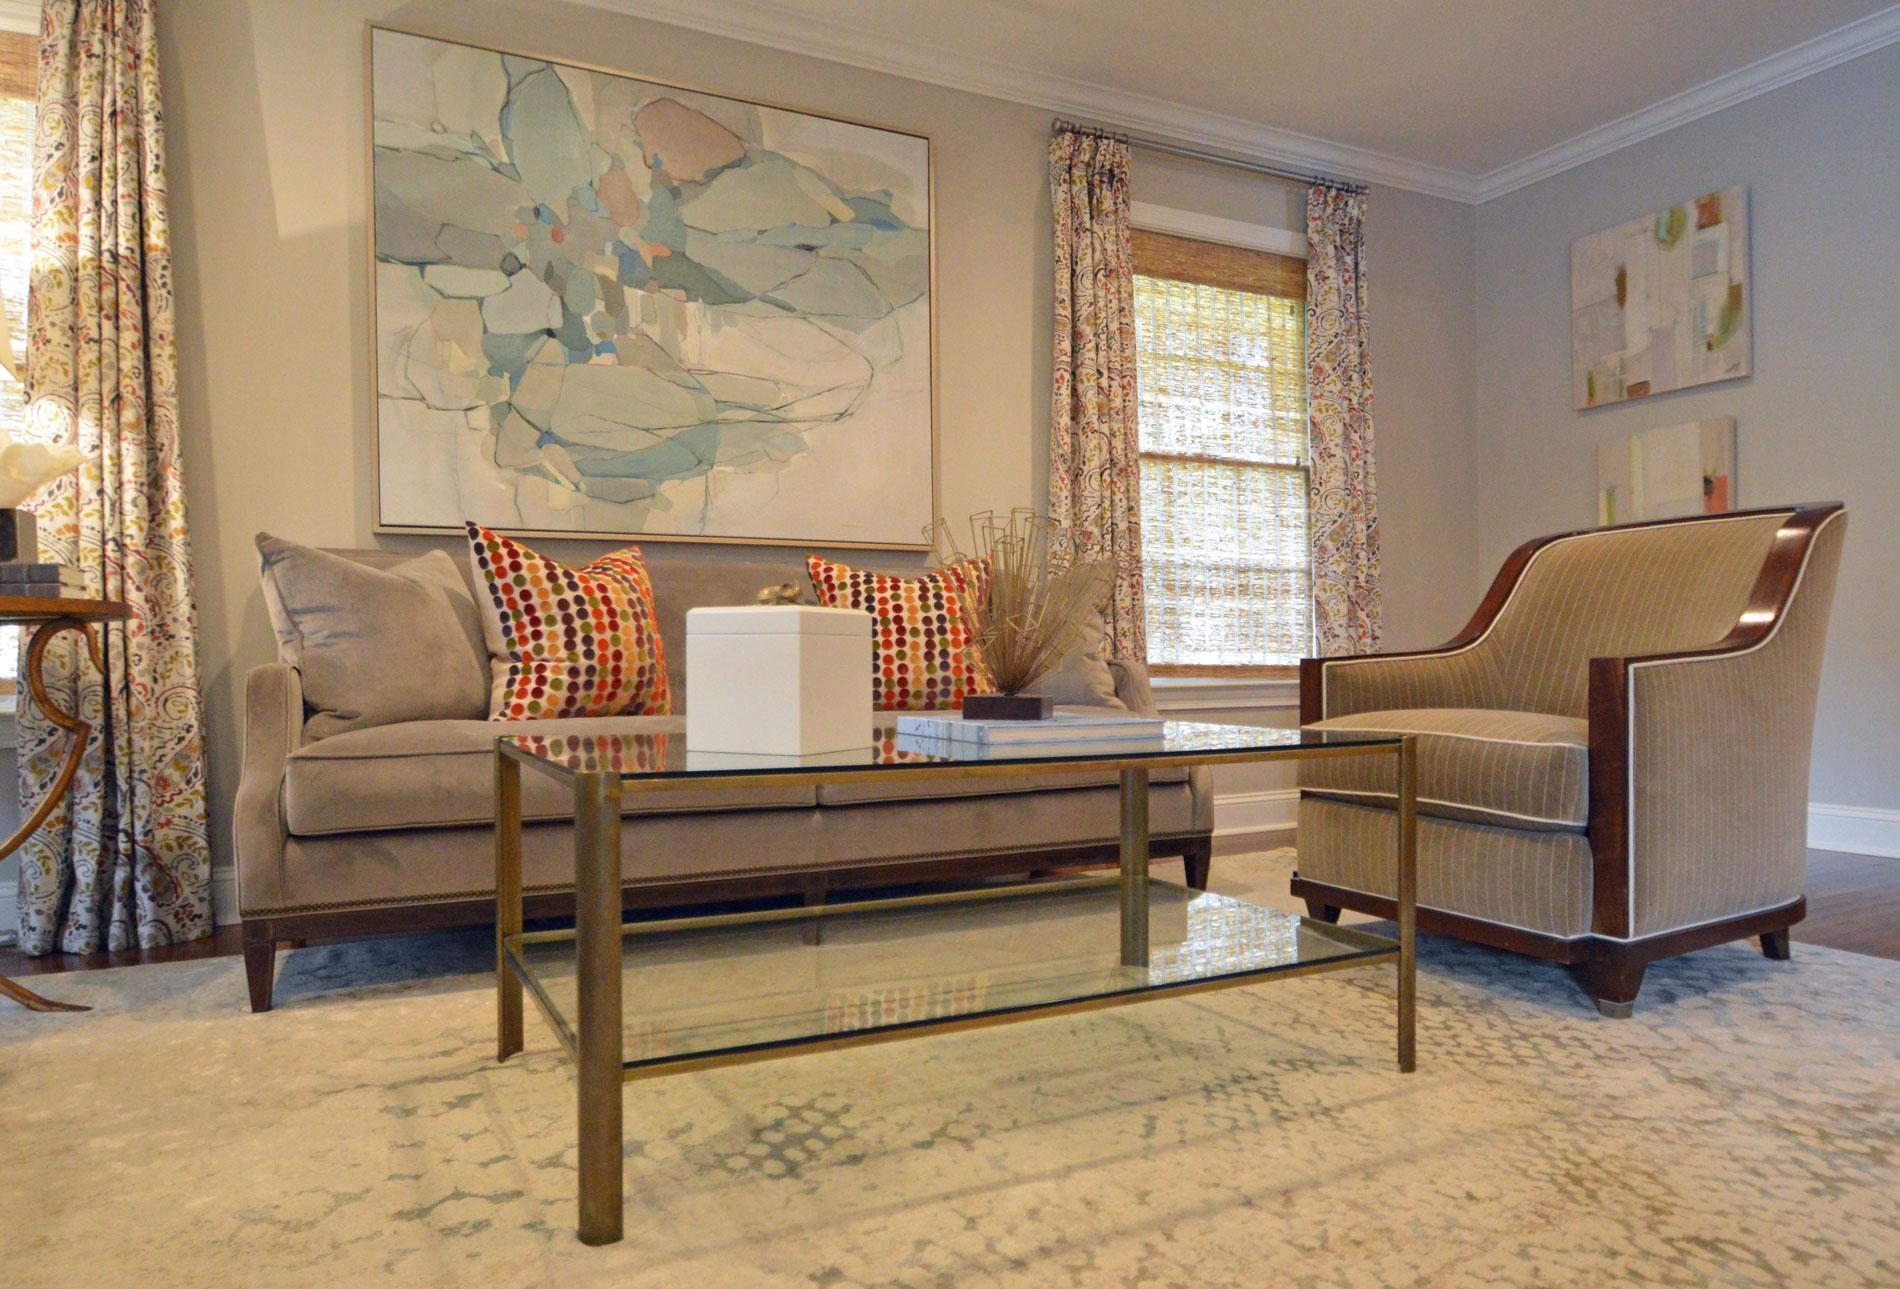 fawley-david2-dixon-smith-interiors-baton-rouge-interior-design-custom-furniture-web-0004